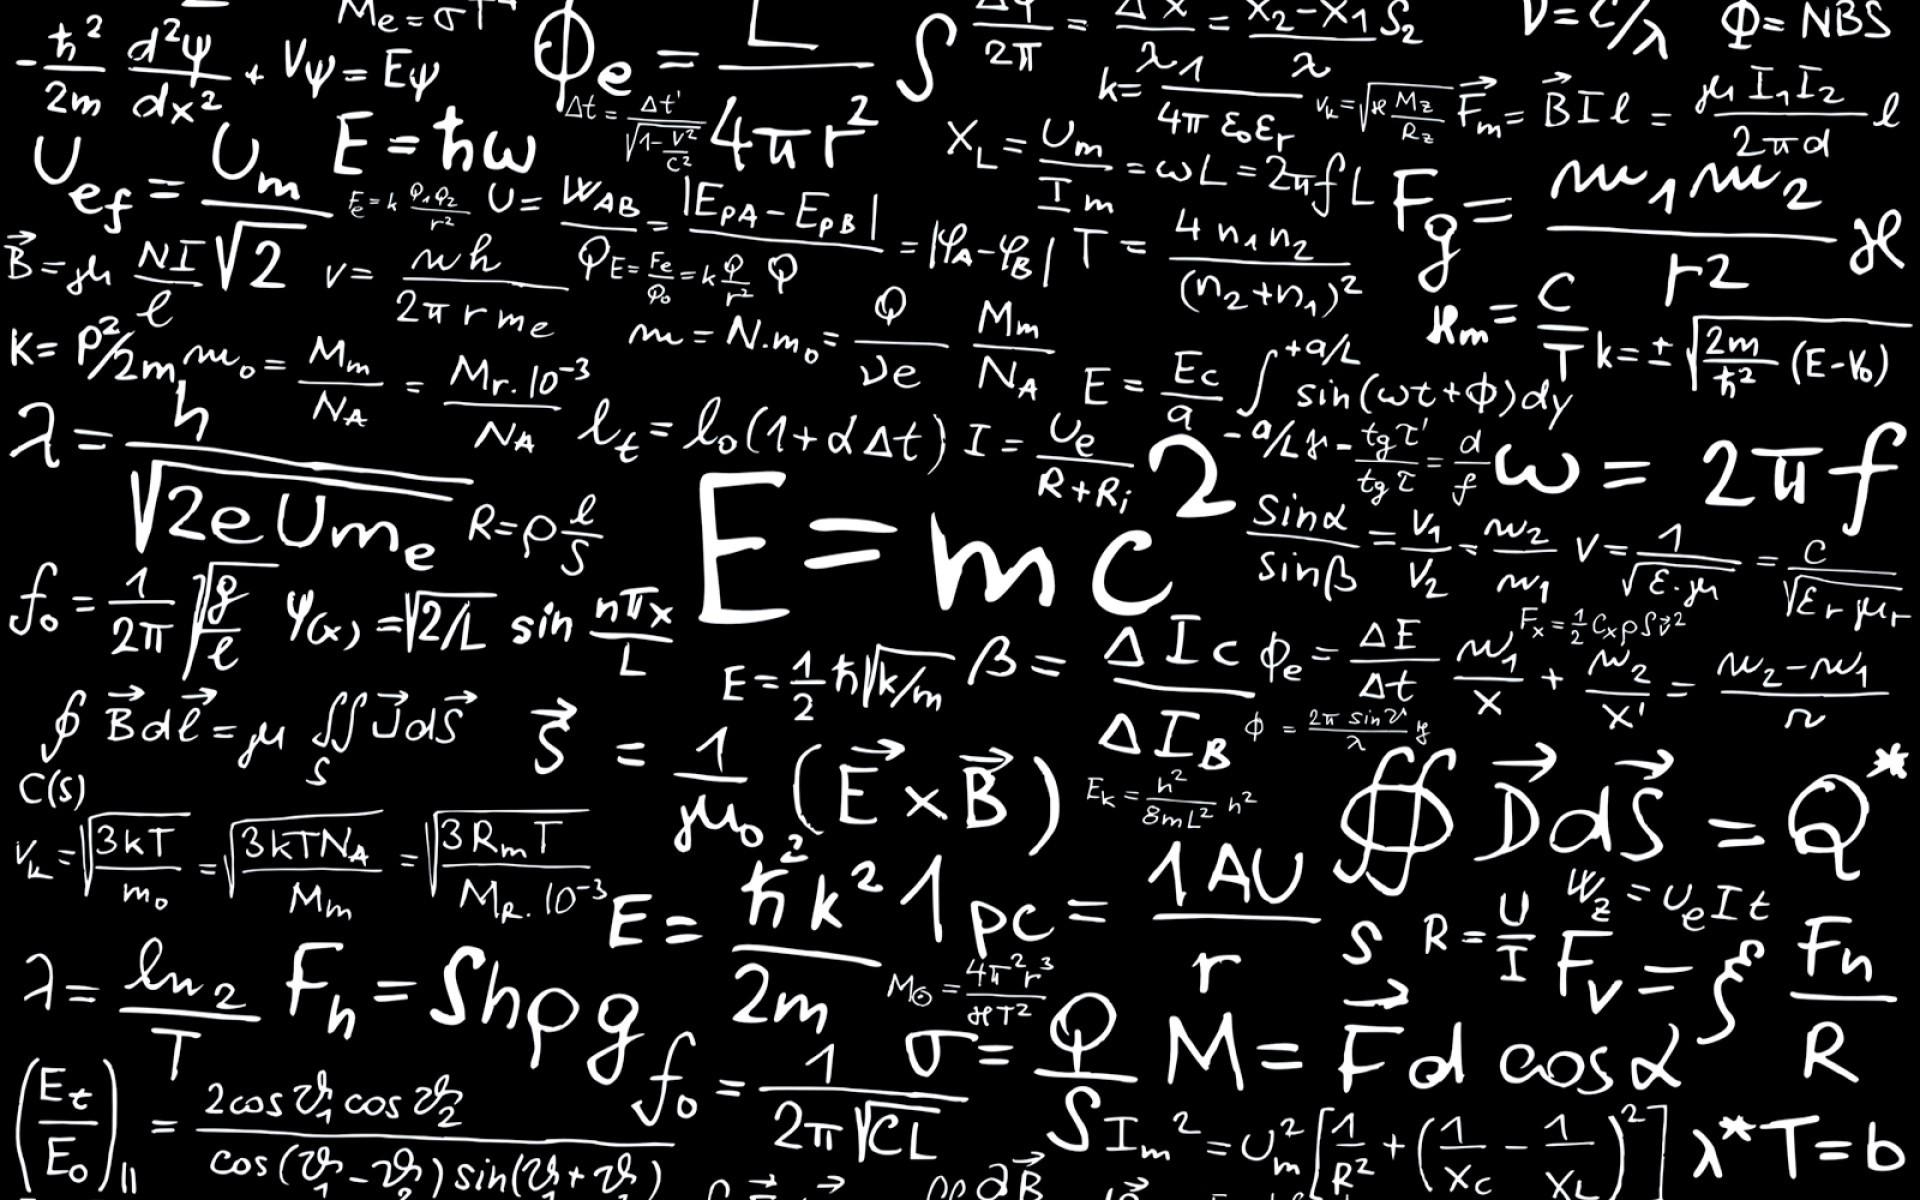 Blackboard Equations WallPaper HD – https://imashon.com/w/blackboard